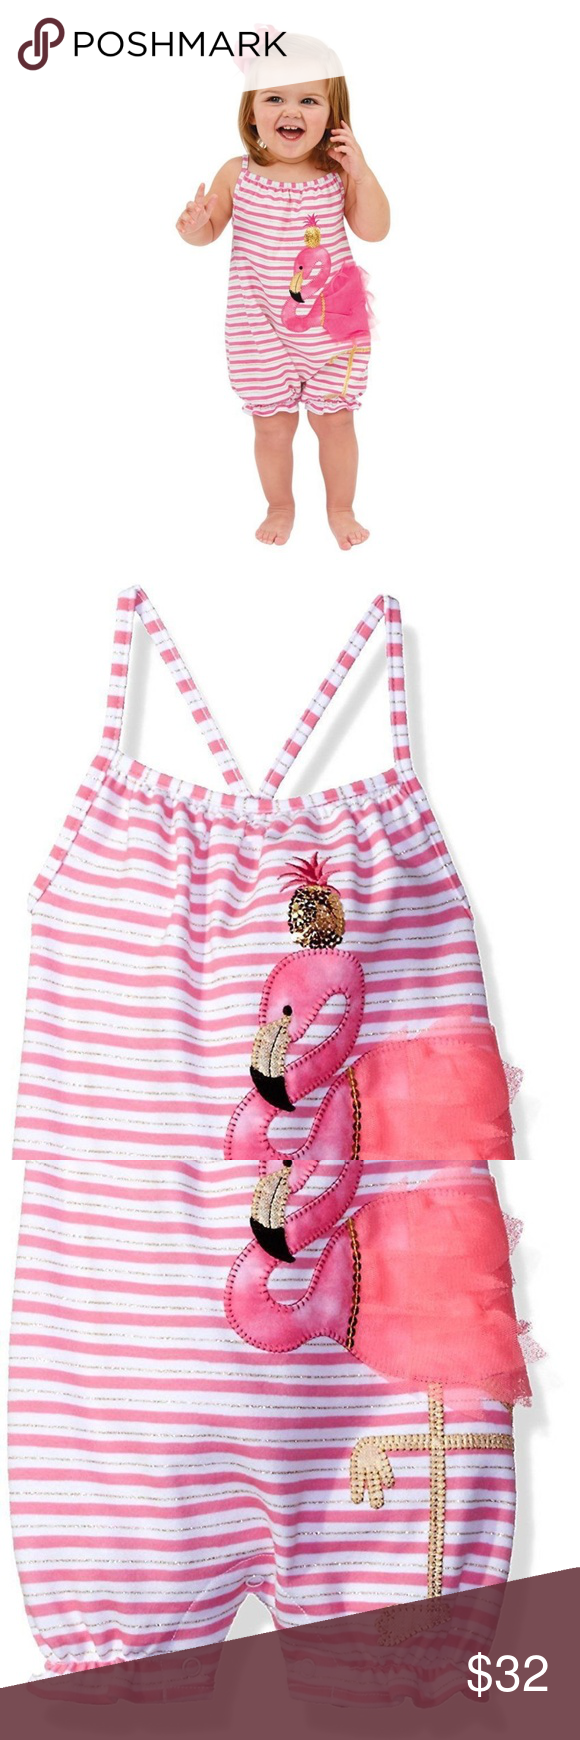 77c0154be245 Mud Pie Flamingo Bubble Romper Outfit 1 Piece 9-12 MUD PIE adorable newborn  girls